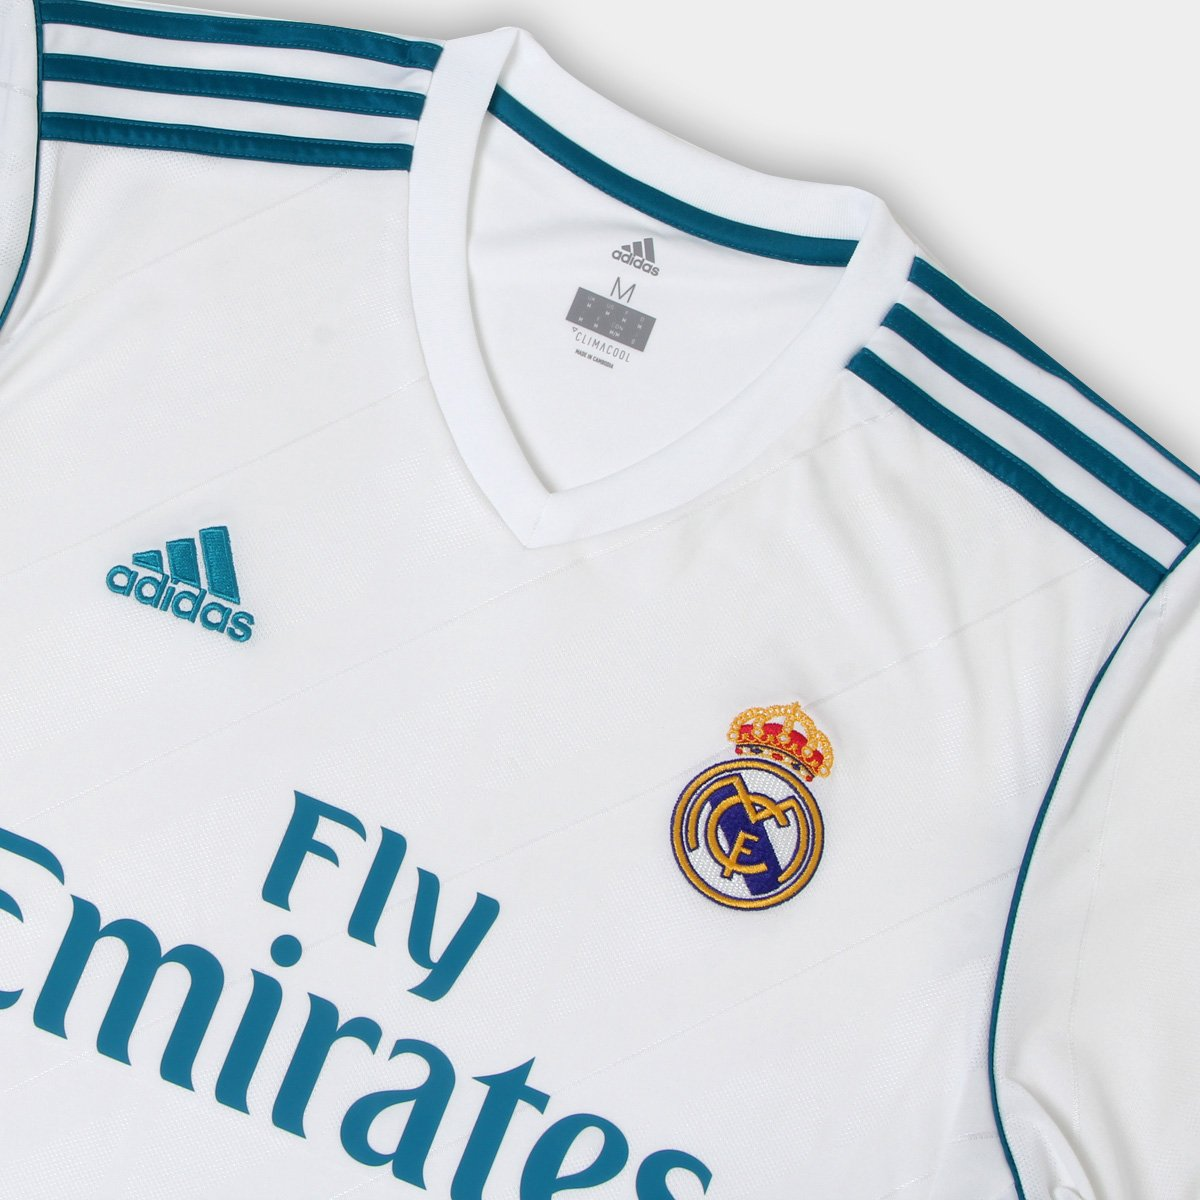 80ea35ebb5b7a1  Camisa Real Madrid Home 17 18 - Torcedor Adidas Masculina -  Branco e . 85853565a1771